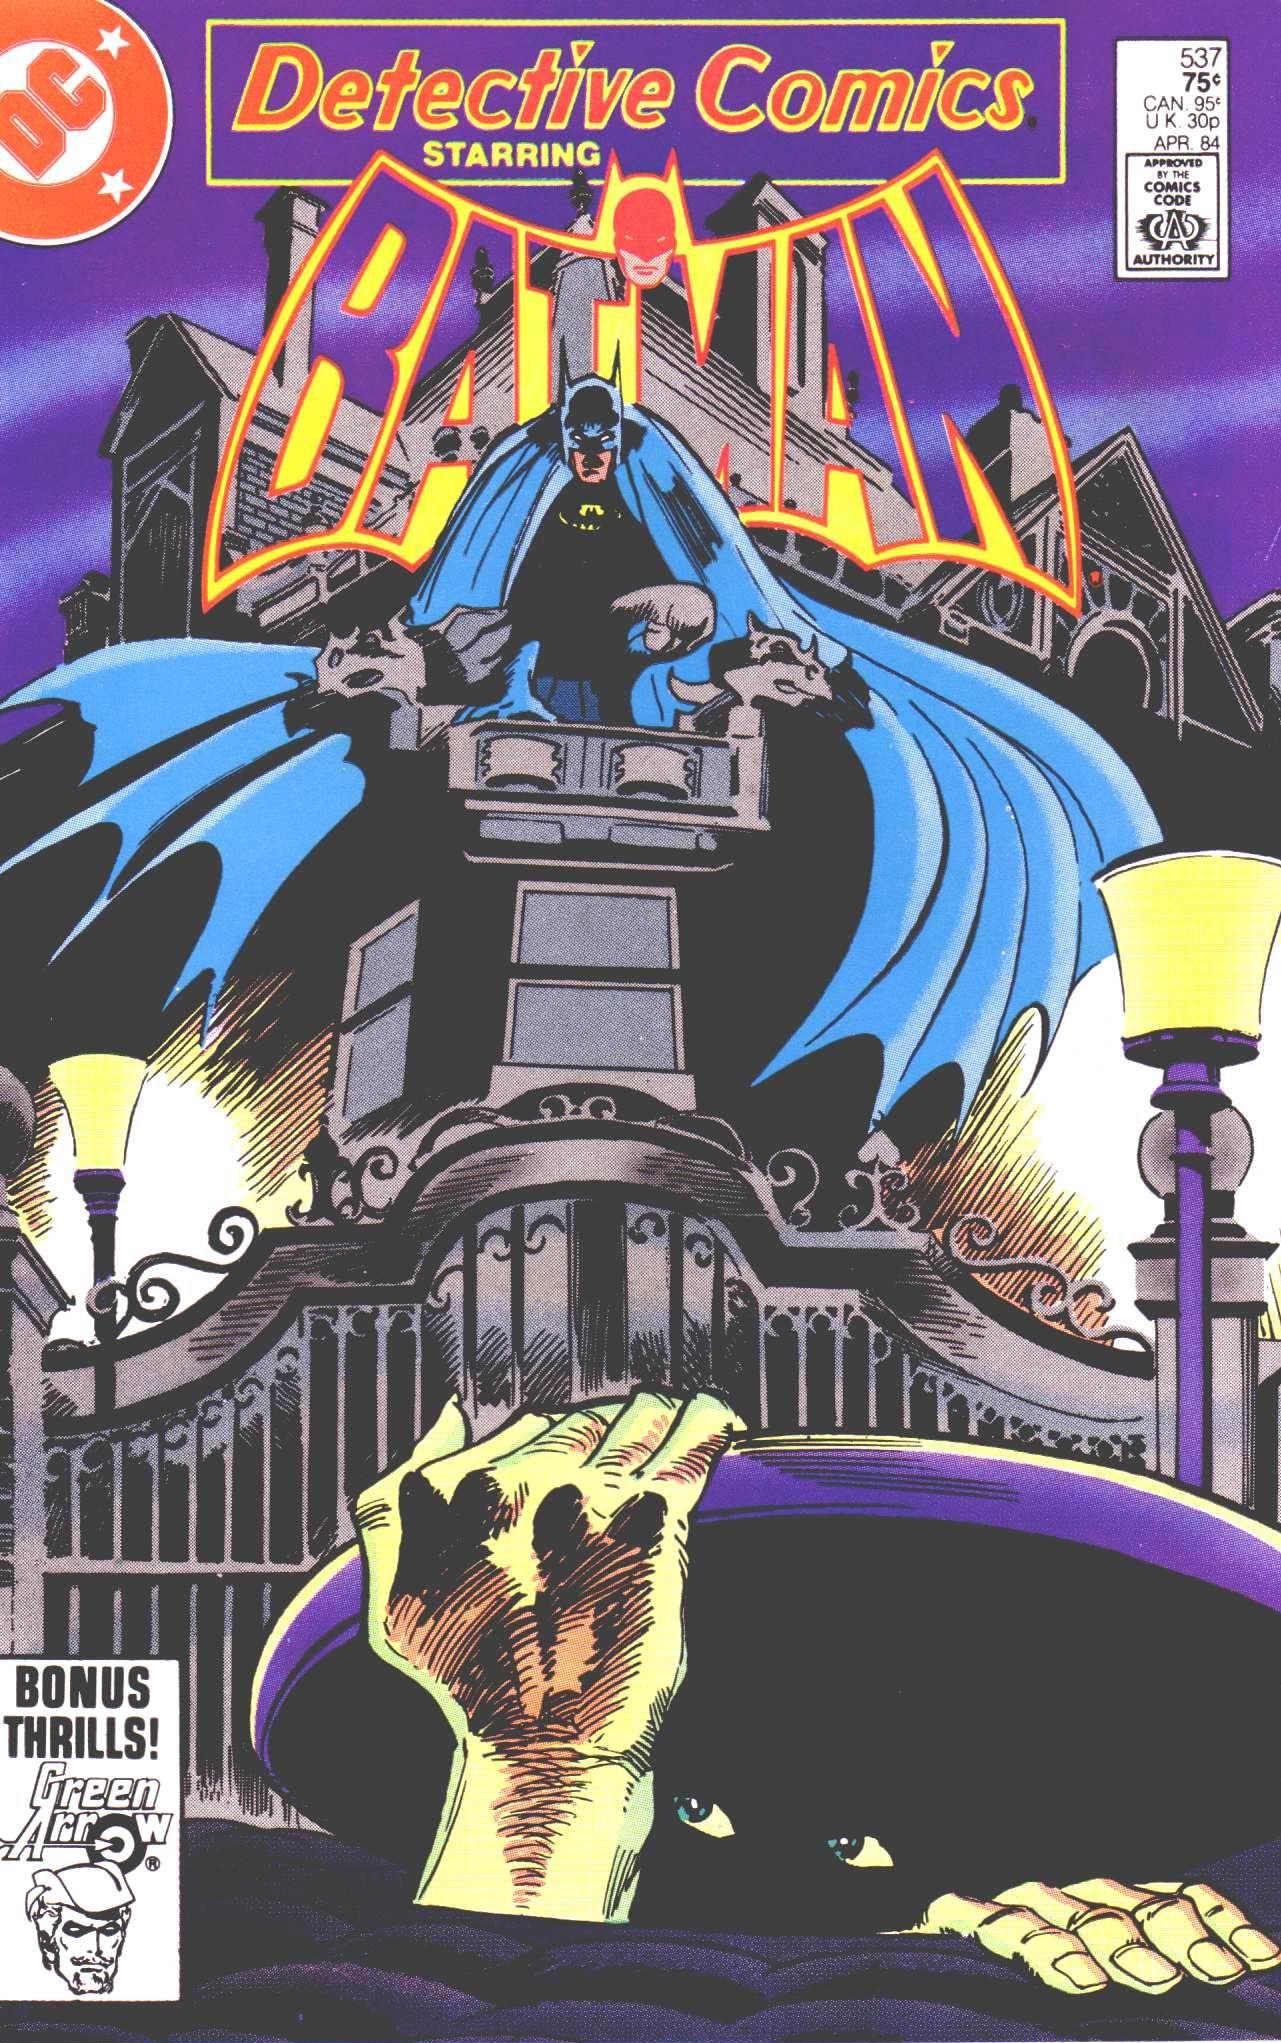 Detective Comics (1937) 537 Page 1